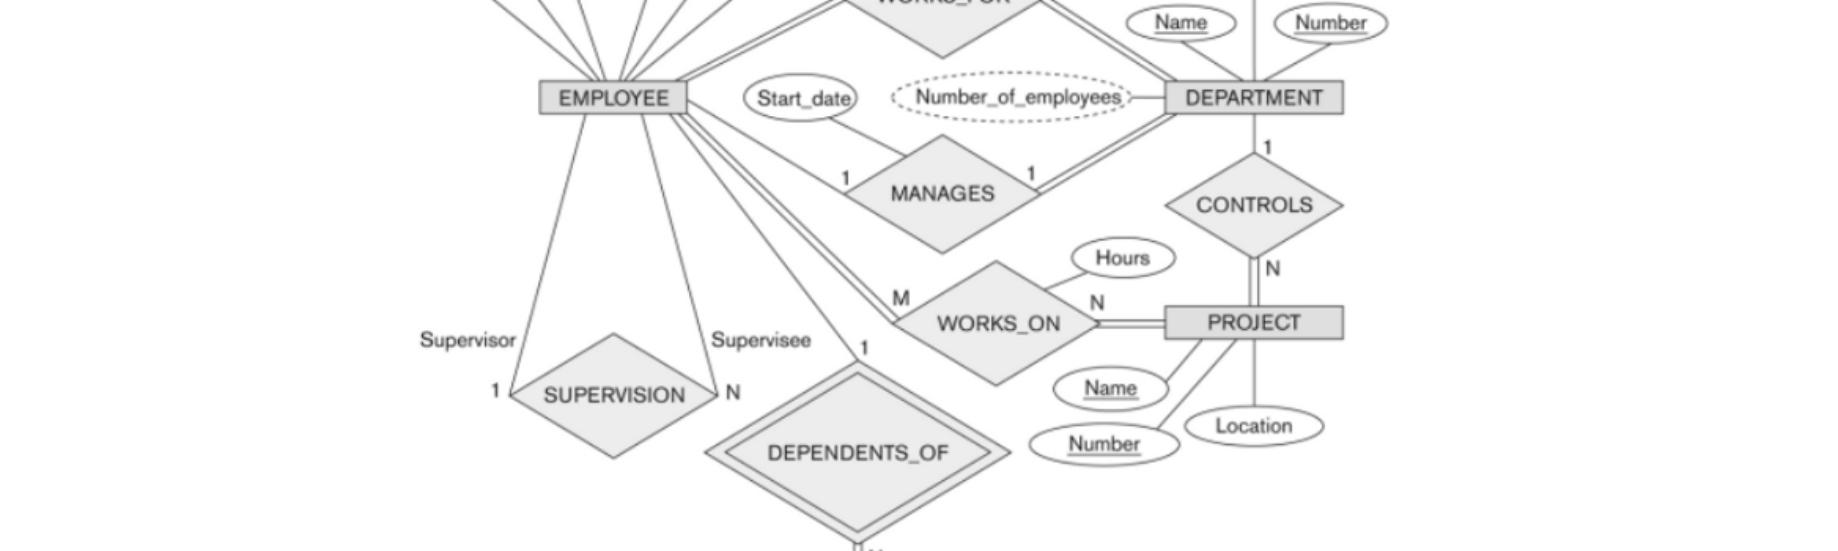 Database — Modeling : Entity Relationship Diagram (Erd) (Part 5) regarding Er Diagram Foreign Key Representation